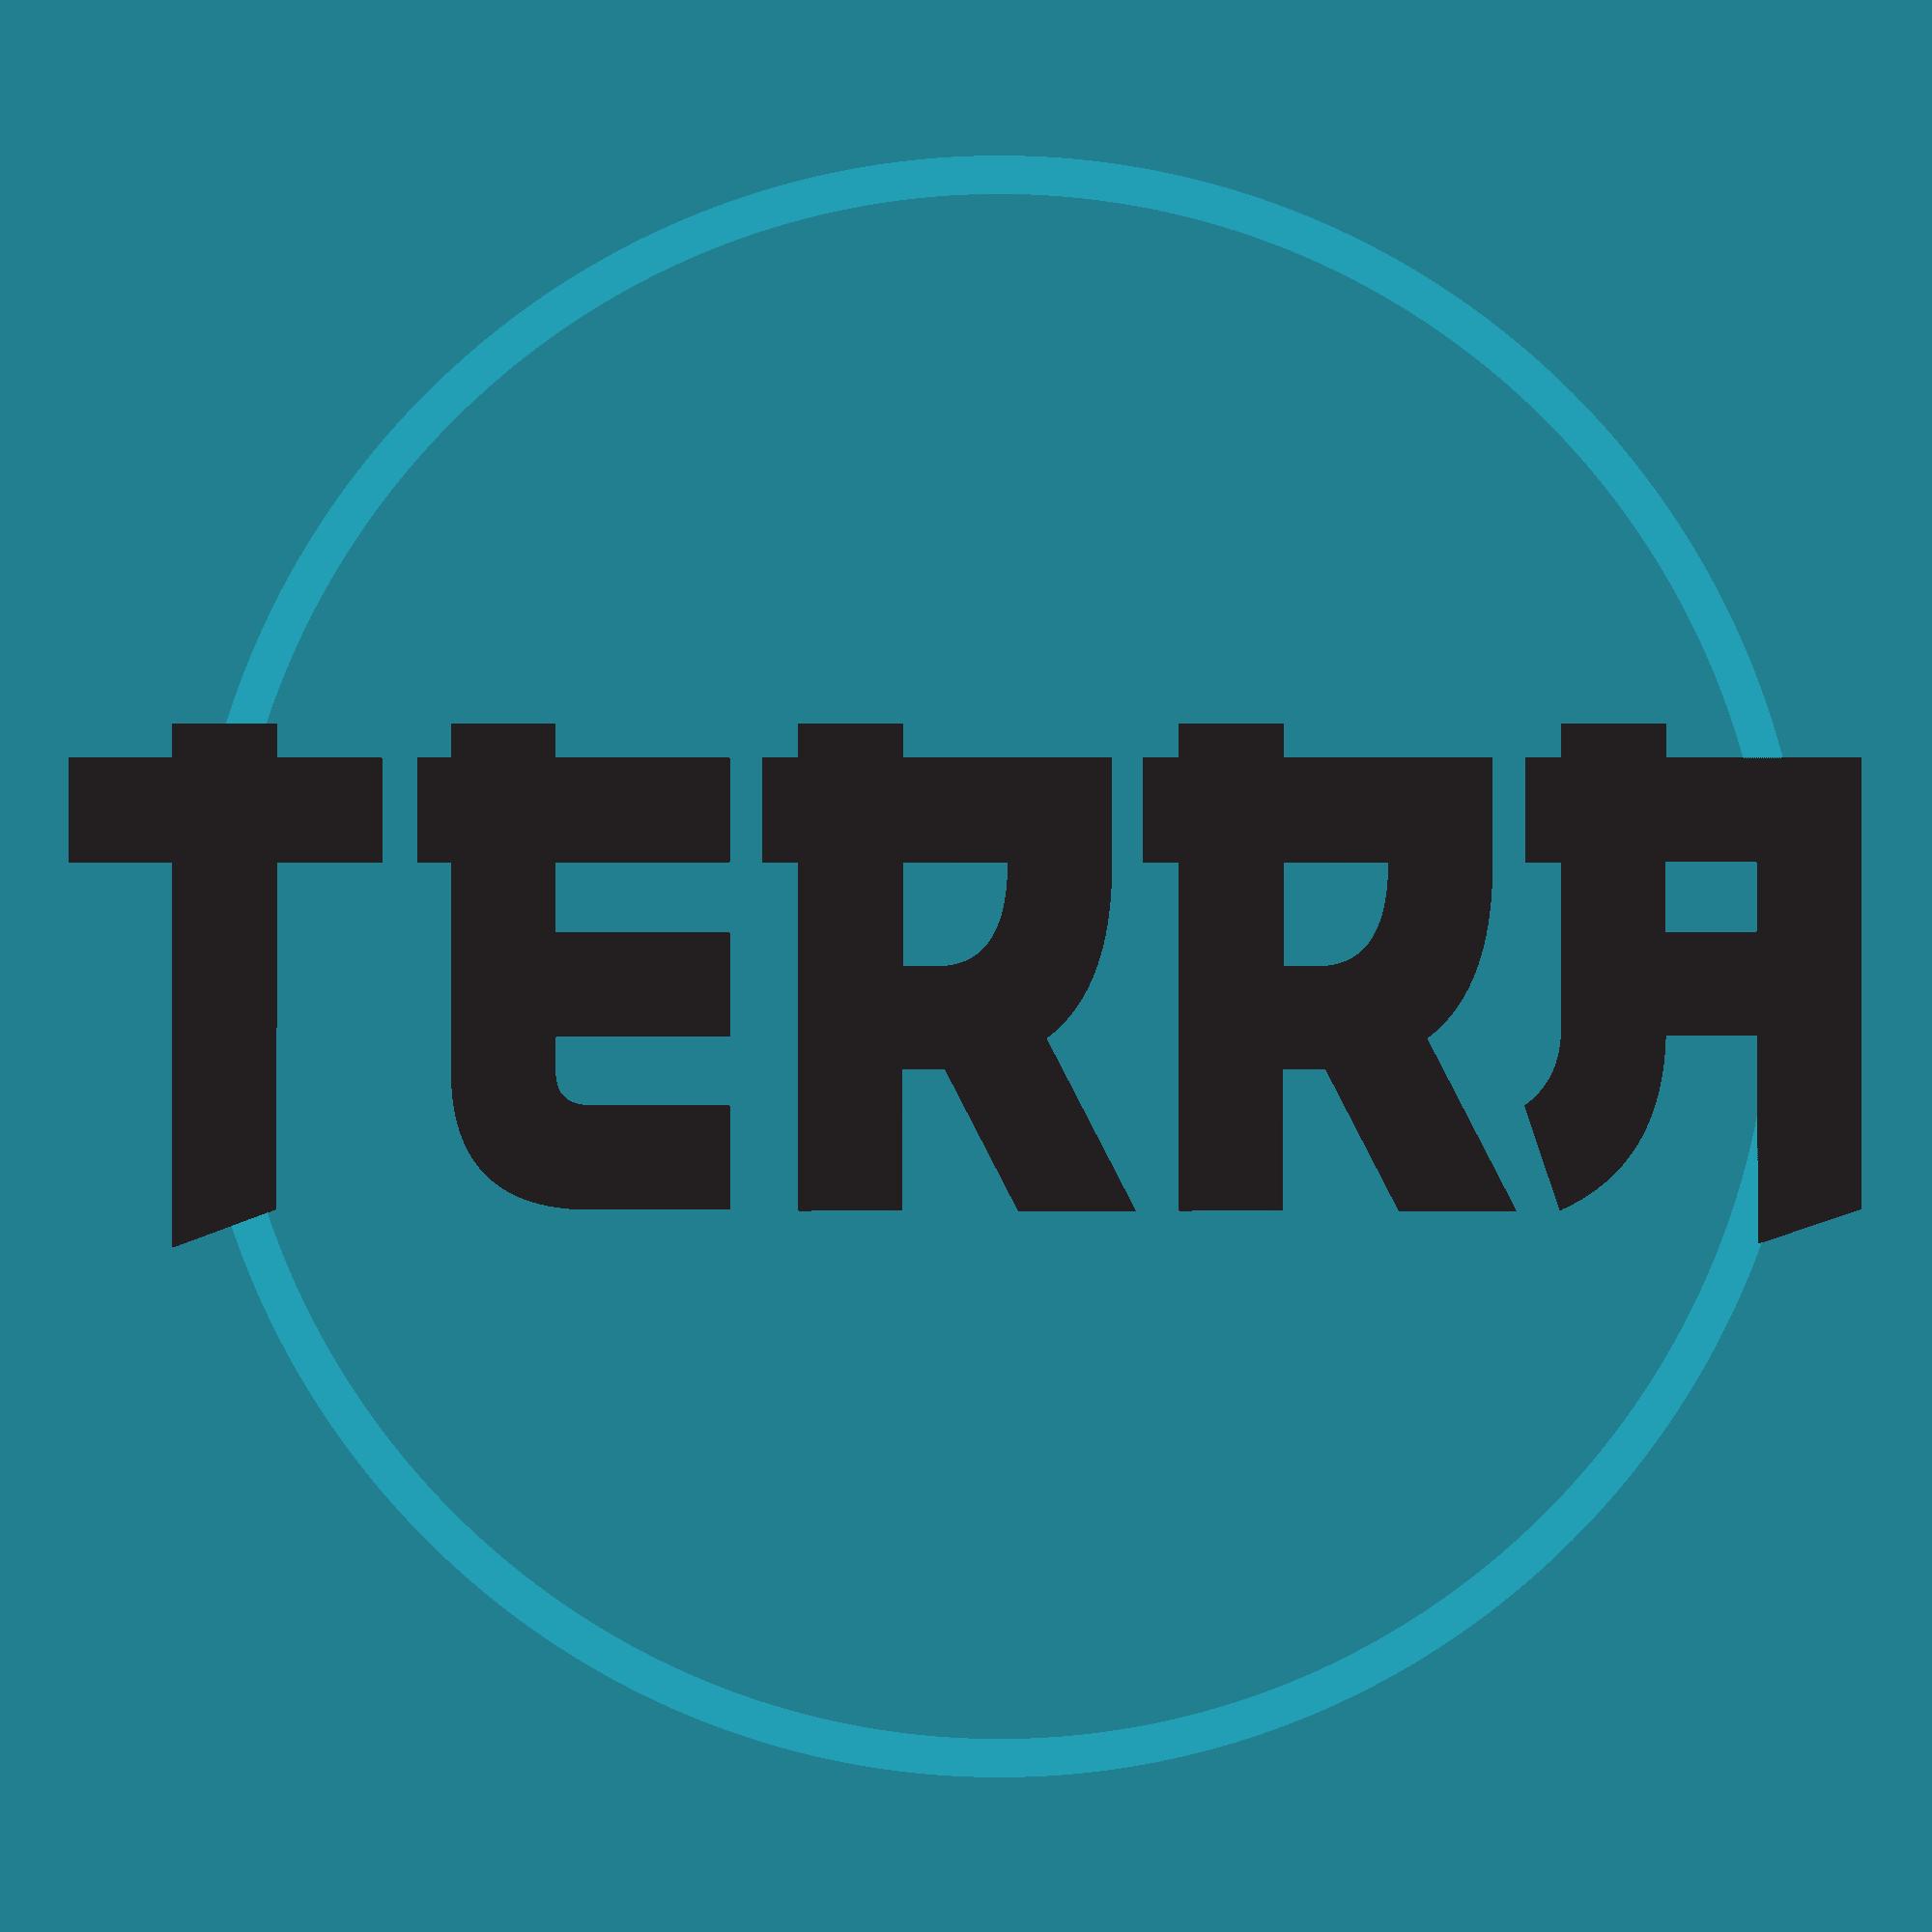 Terra Black